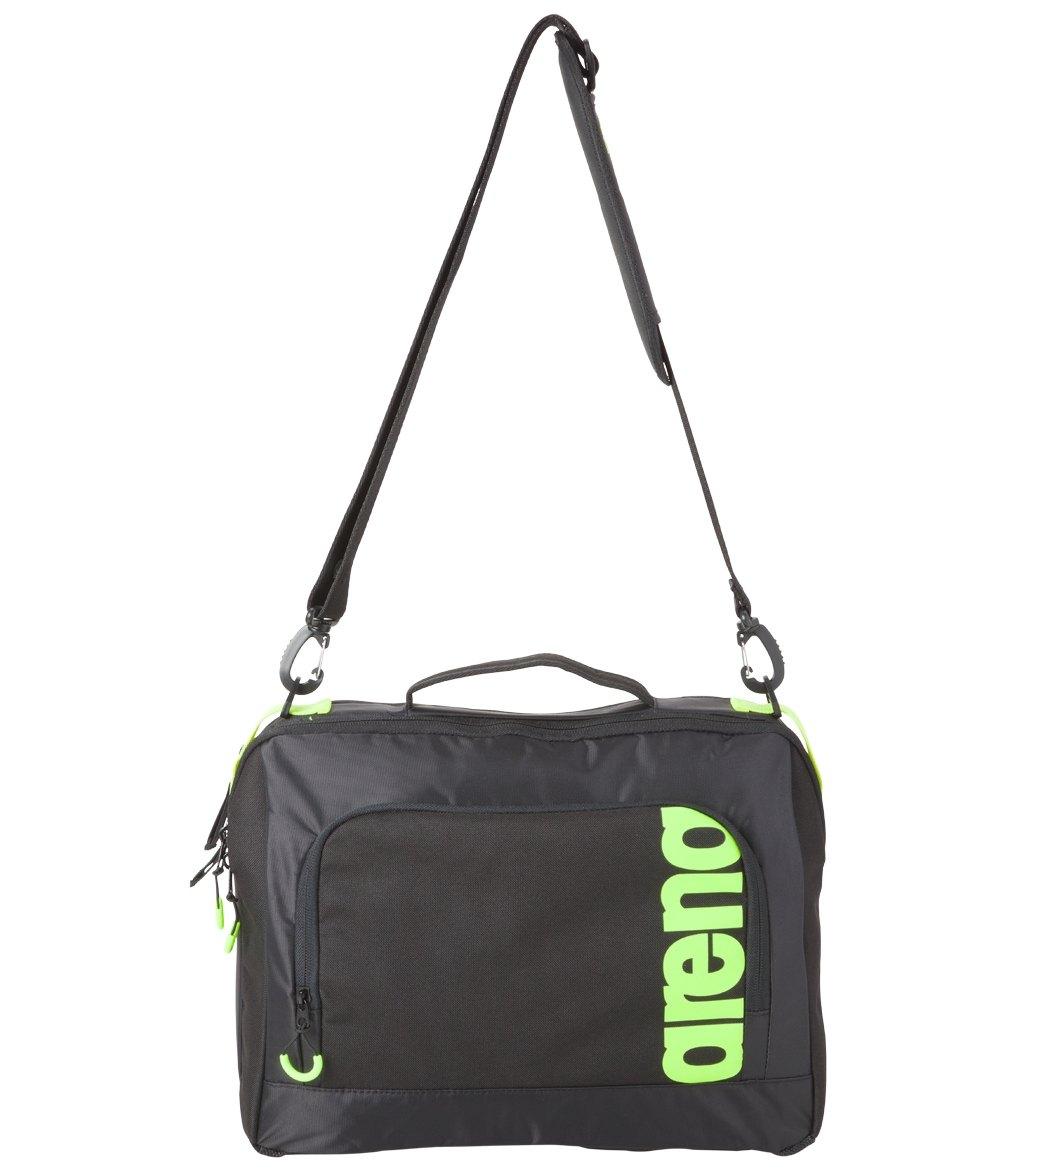 coach bag outlet usa 9v16  coach bag outlet usa